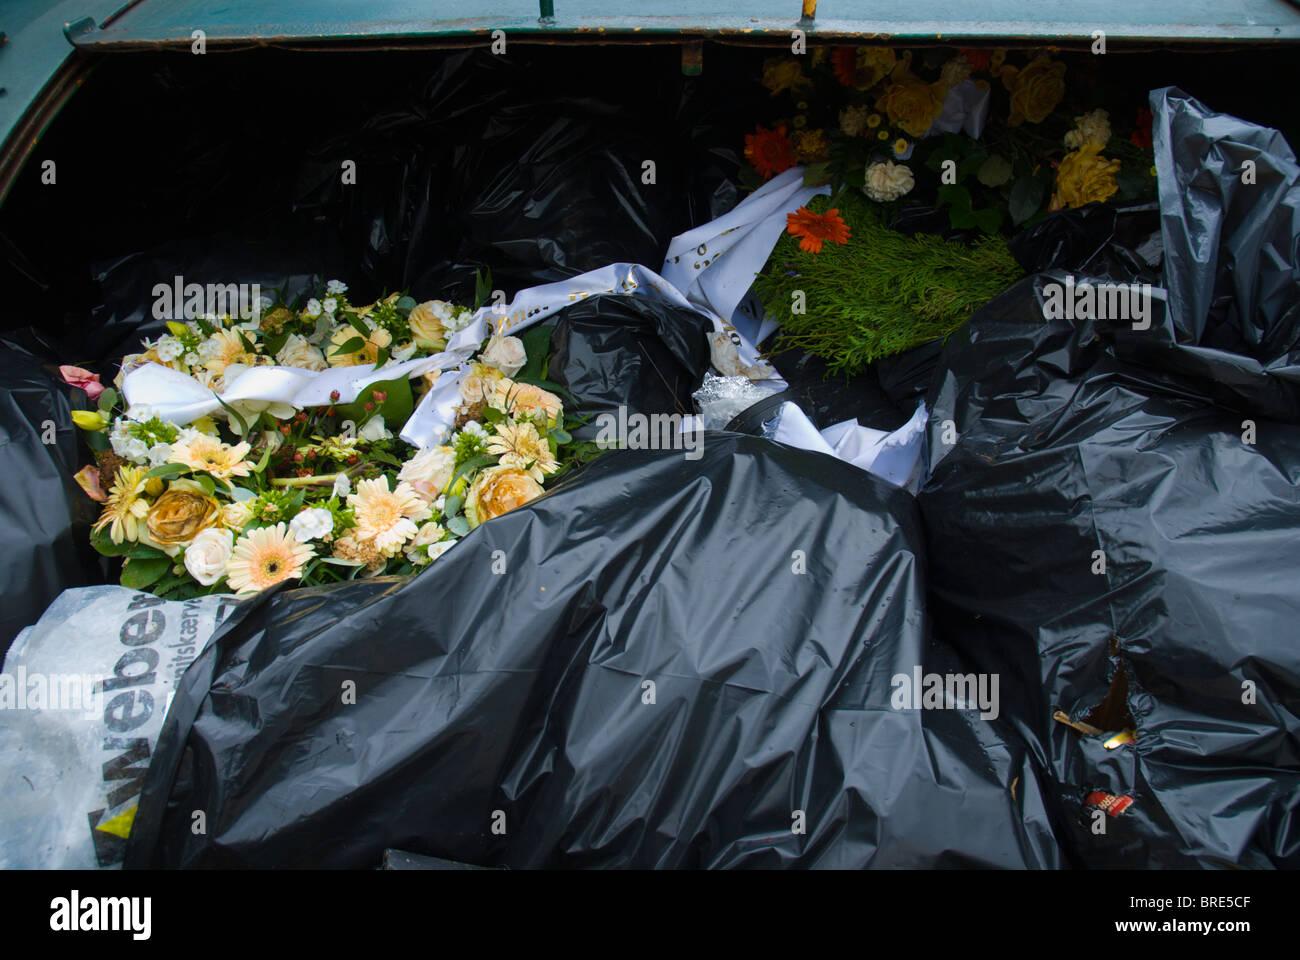 Thrown away wreaths and flowers Helsingor north Sjaelland Denmark Europe - Stock Image